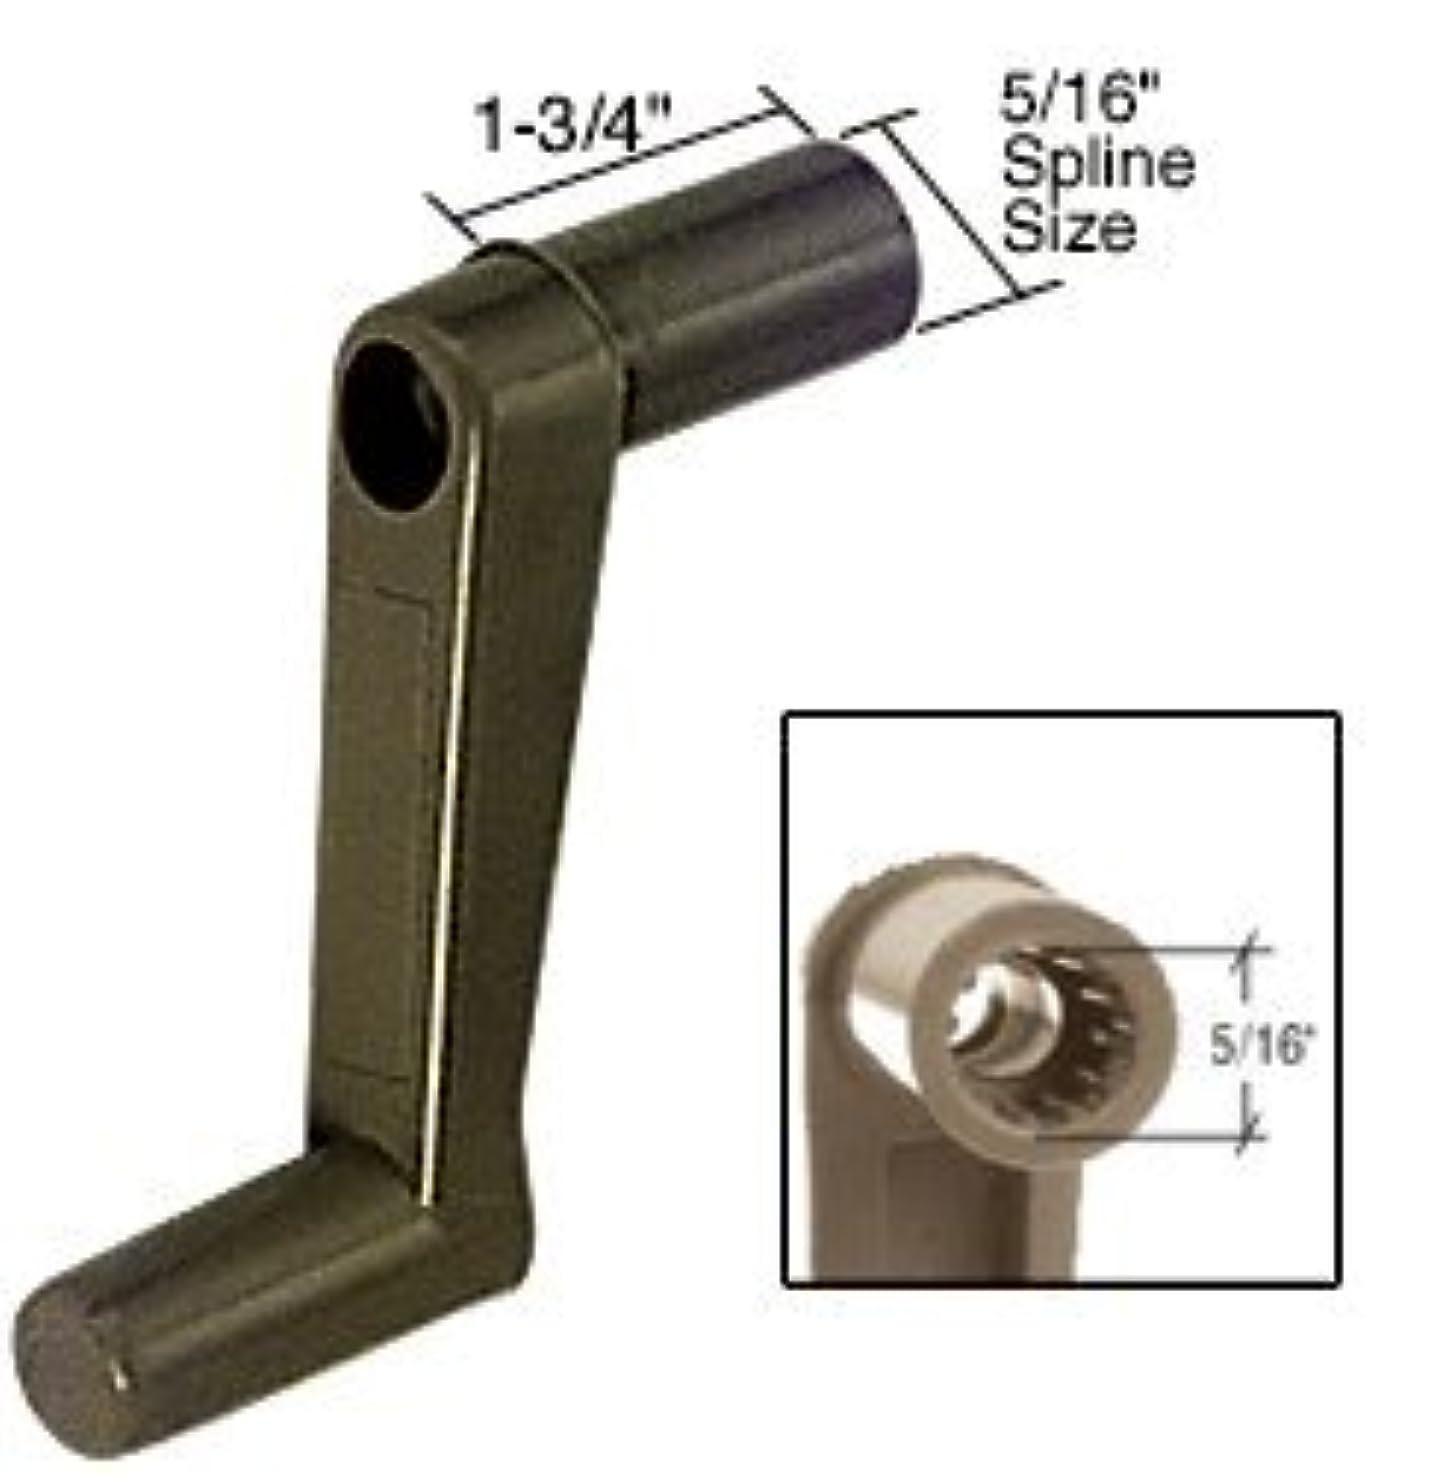 RV Window Crank Handle, 1-3/4